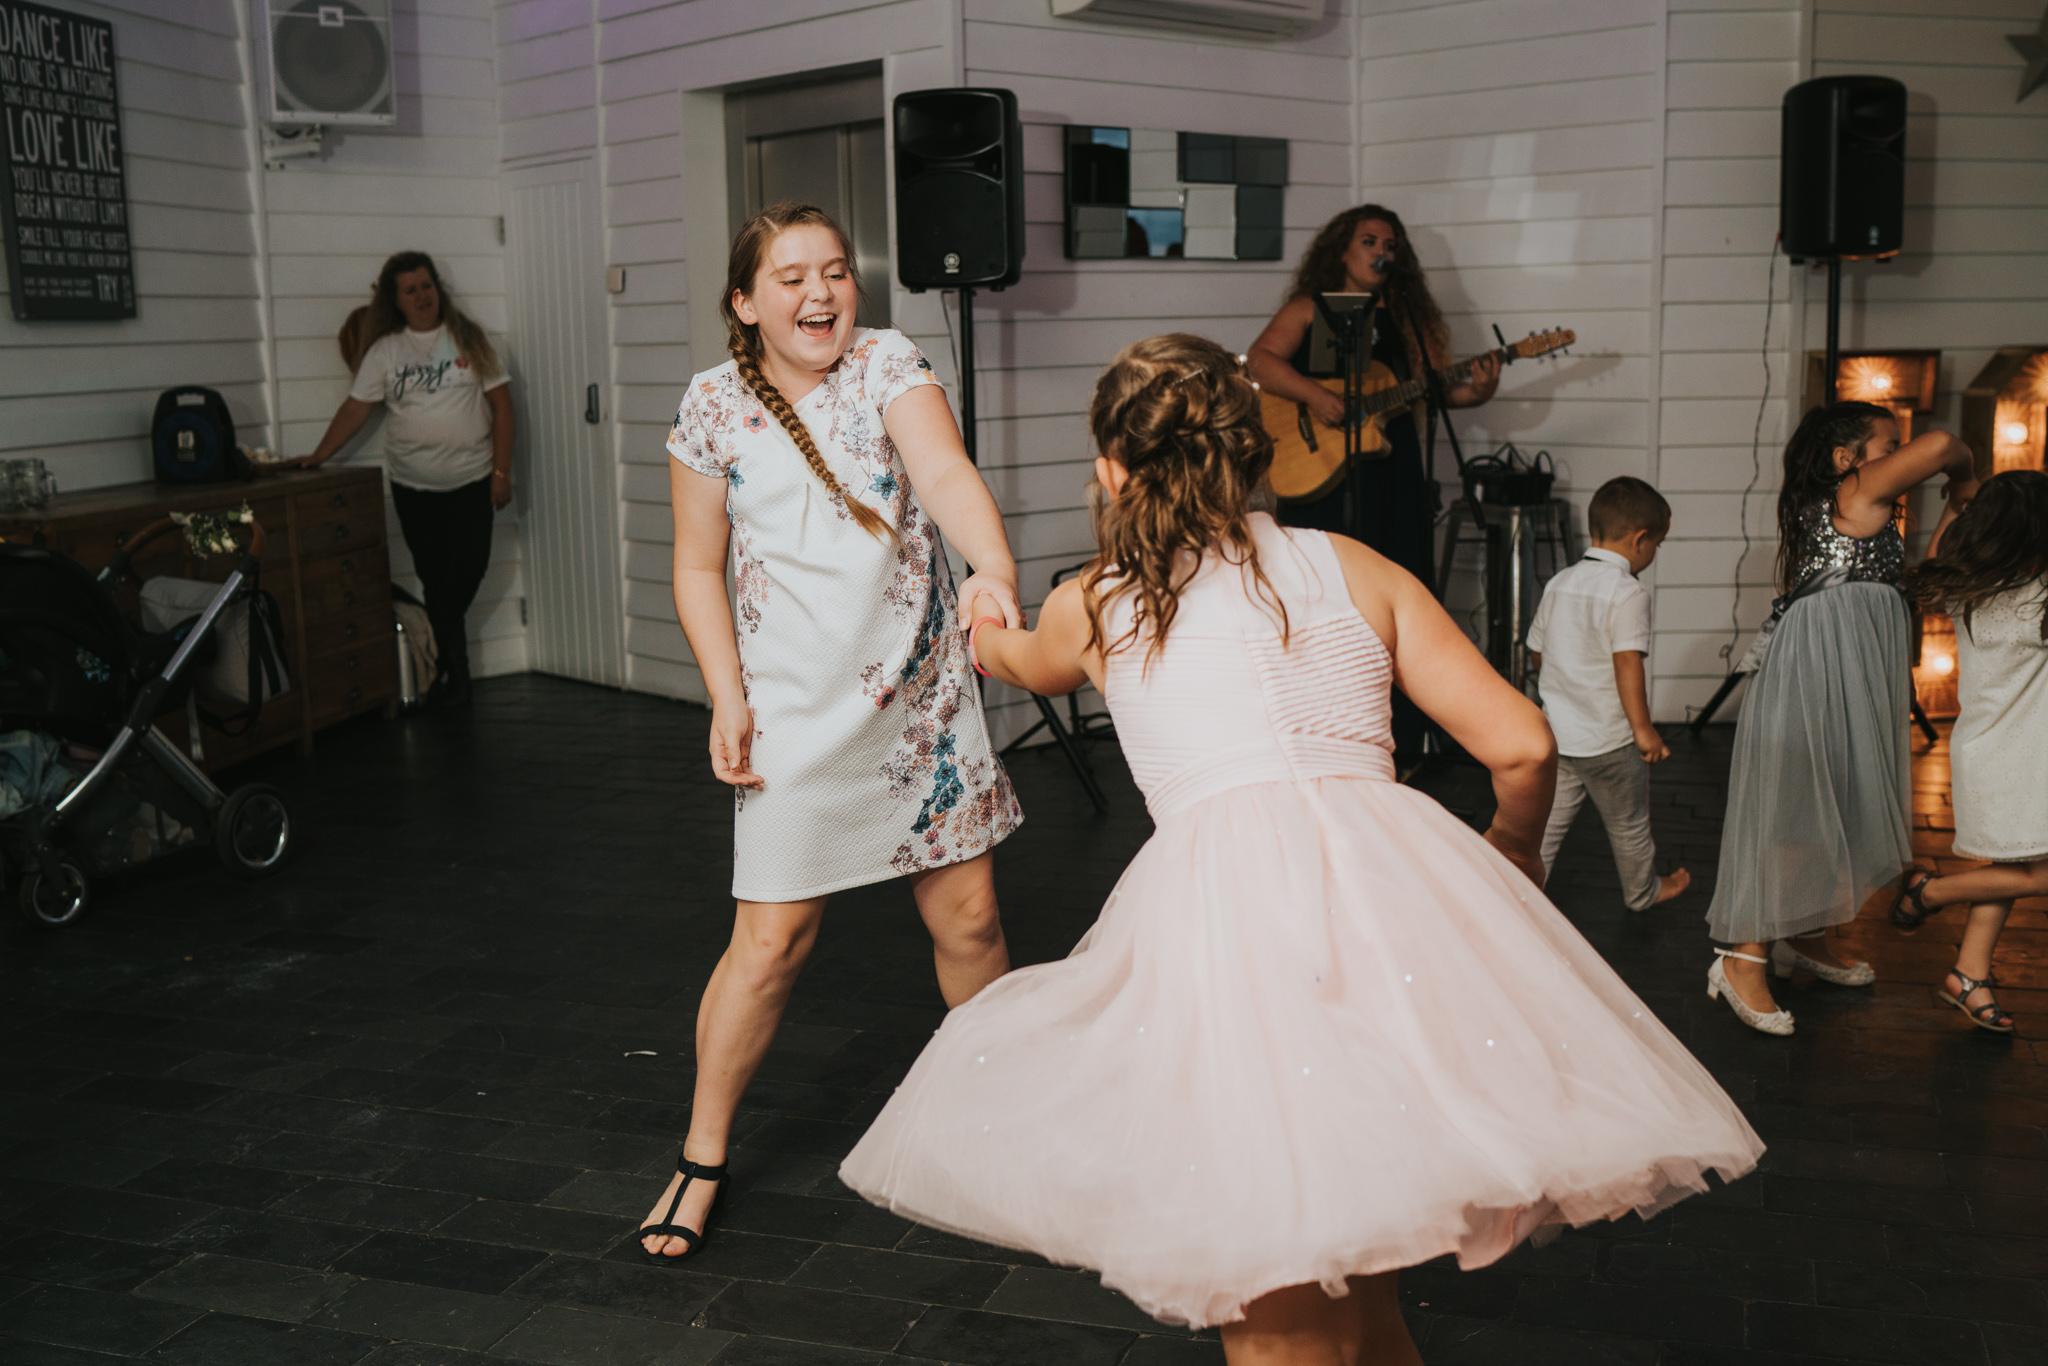 john-amy-relaxed-beach-wedding-tunnels-beaches-ilfracombe-north-devon-grace-elizabeth-colchester-essex-alternative-relaxed-wedding-photography-devon-suffolk-norfolk-essex (147 of 159).jpg